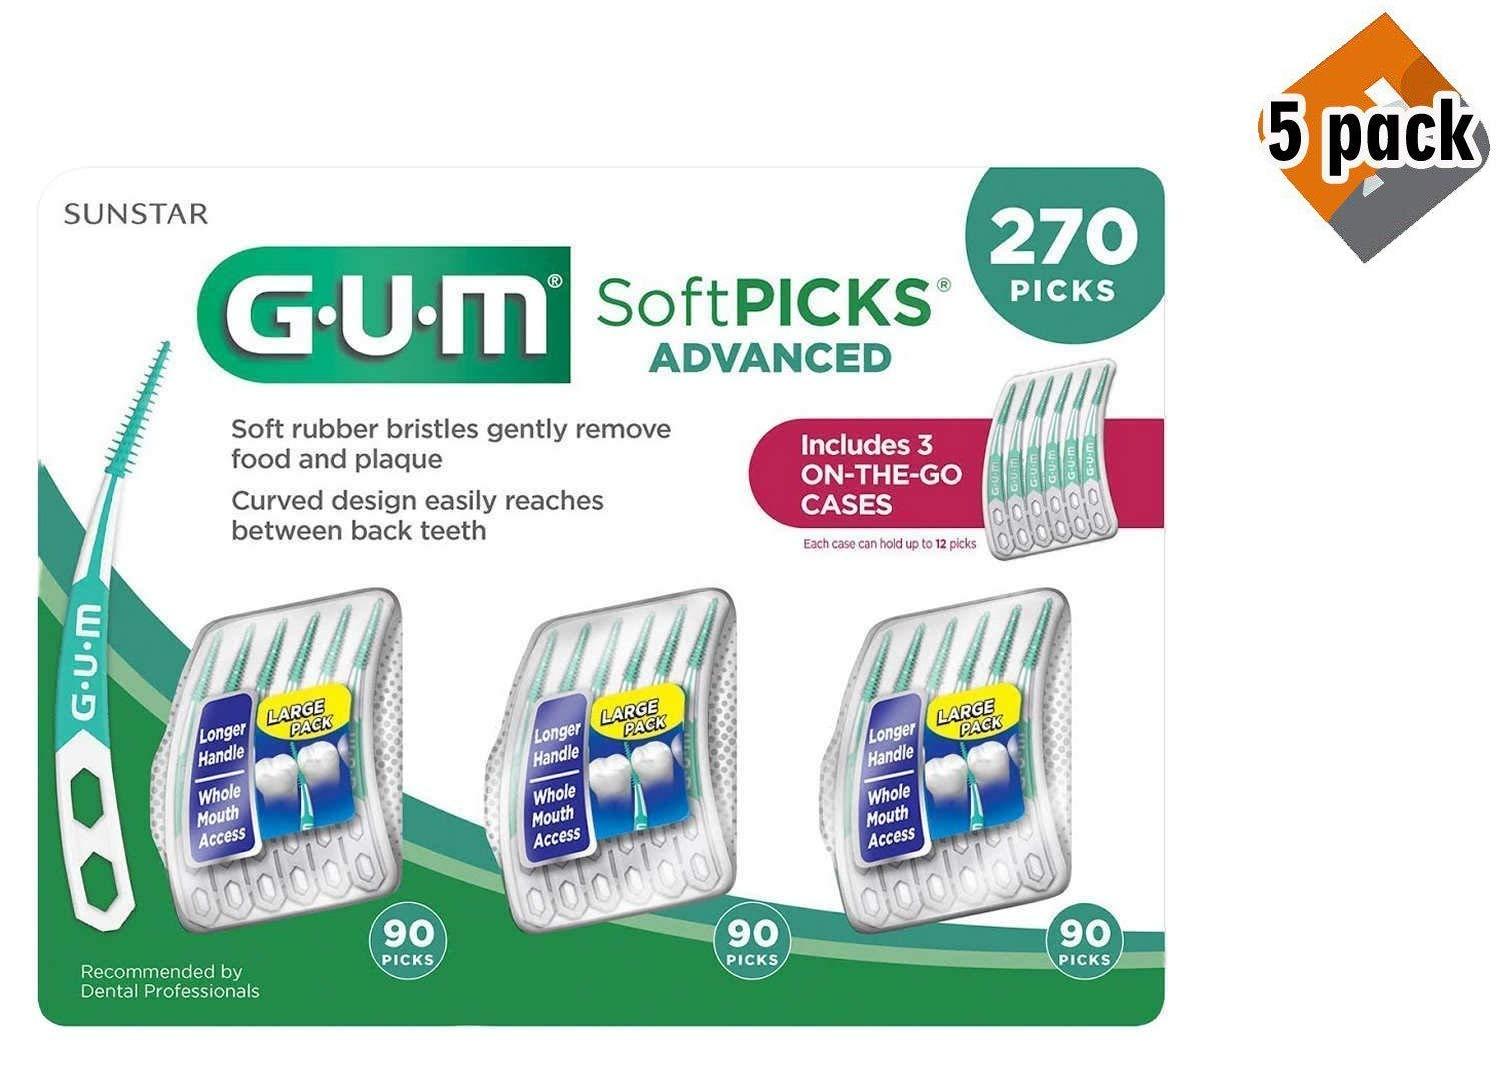 GUM Soft-Picks Advanced Dental Picks, 270 Count - 5 Pack